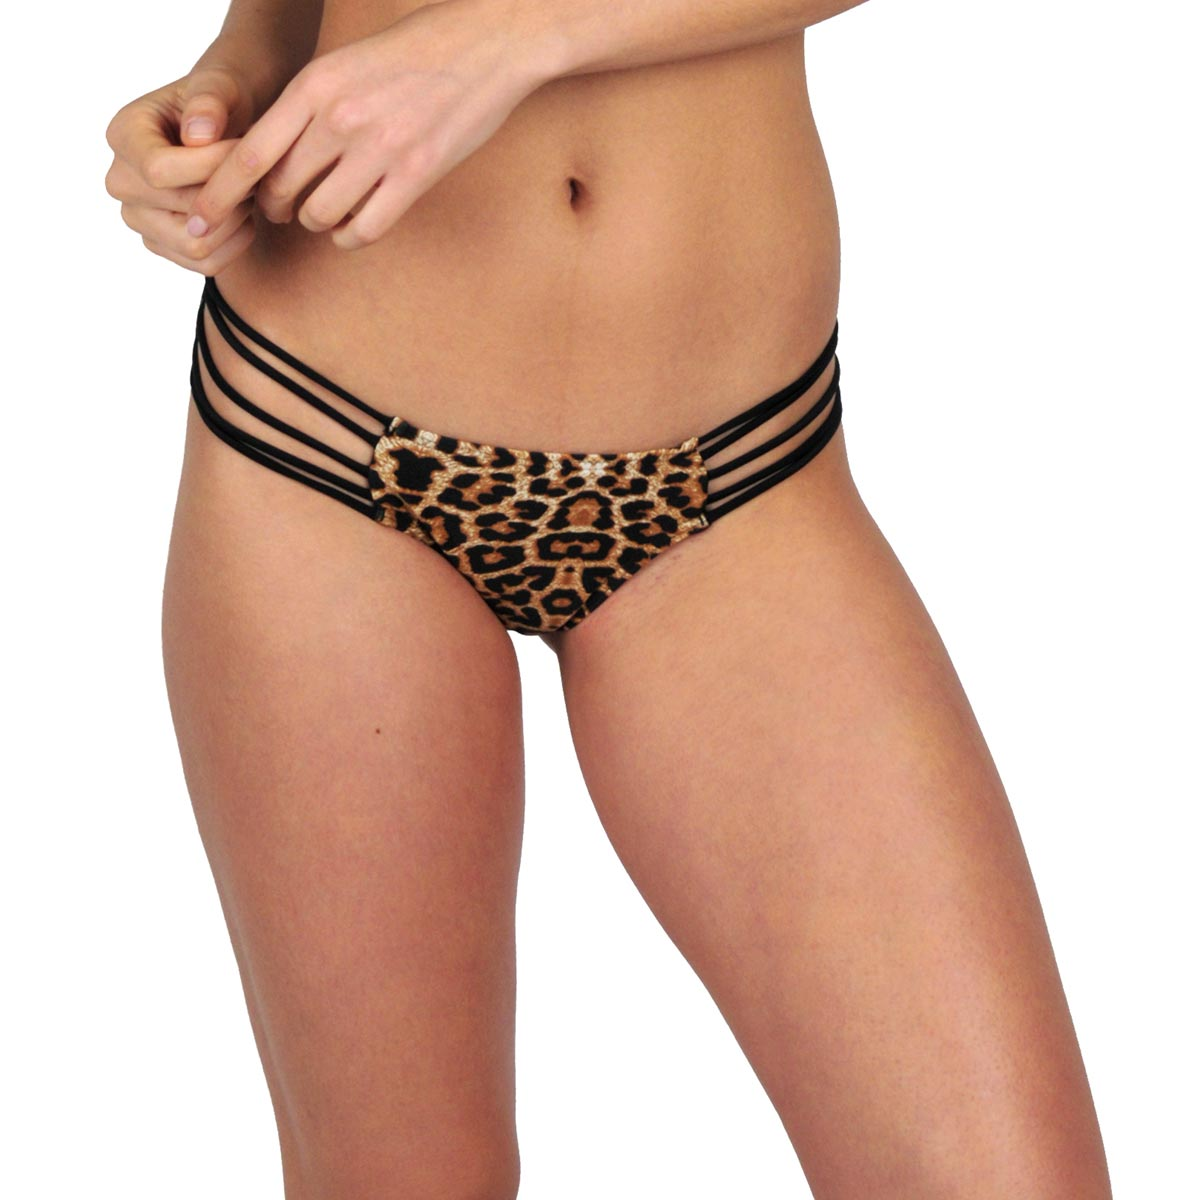 Ma culotte Itsy Bikini  léopard et noir (Bas)